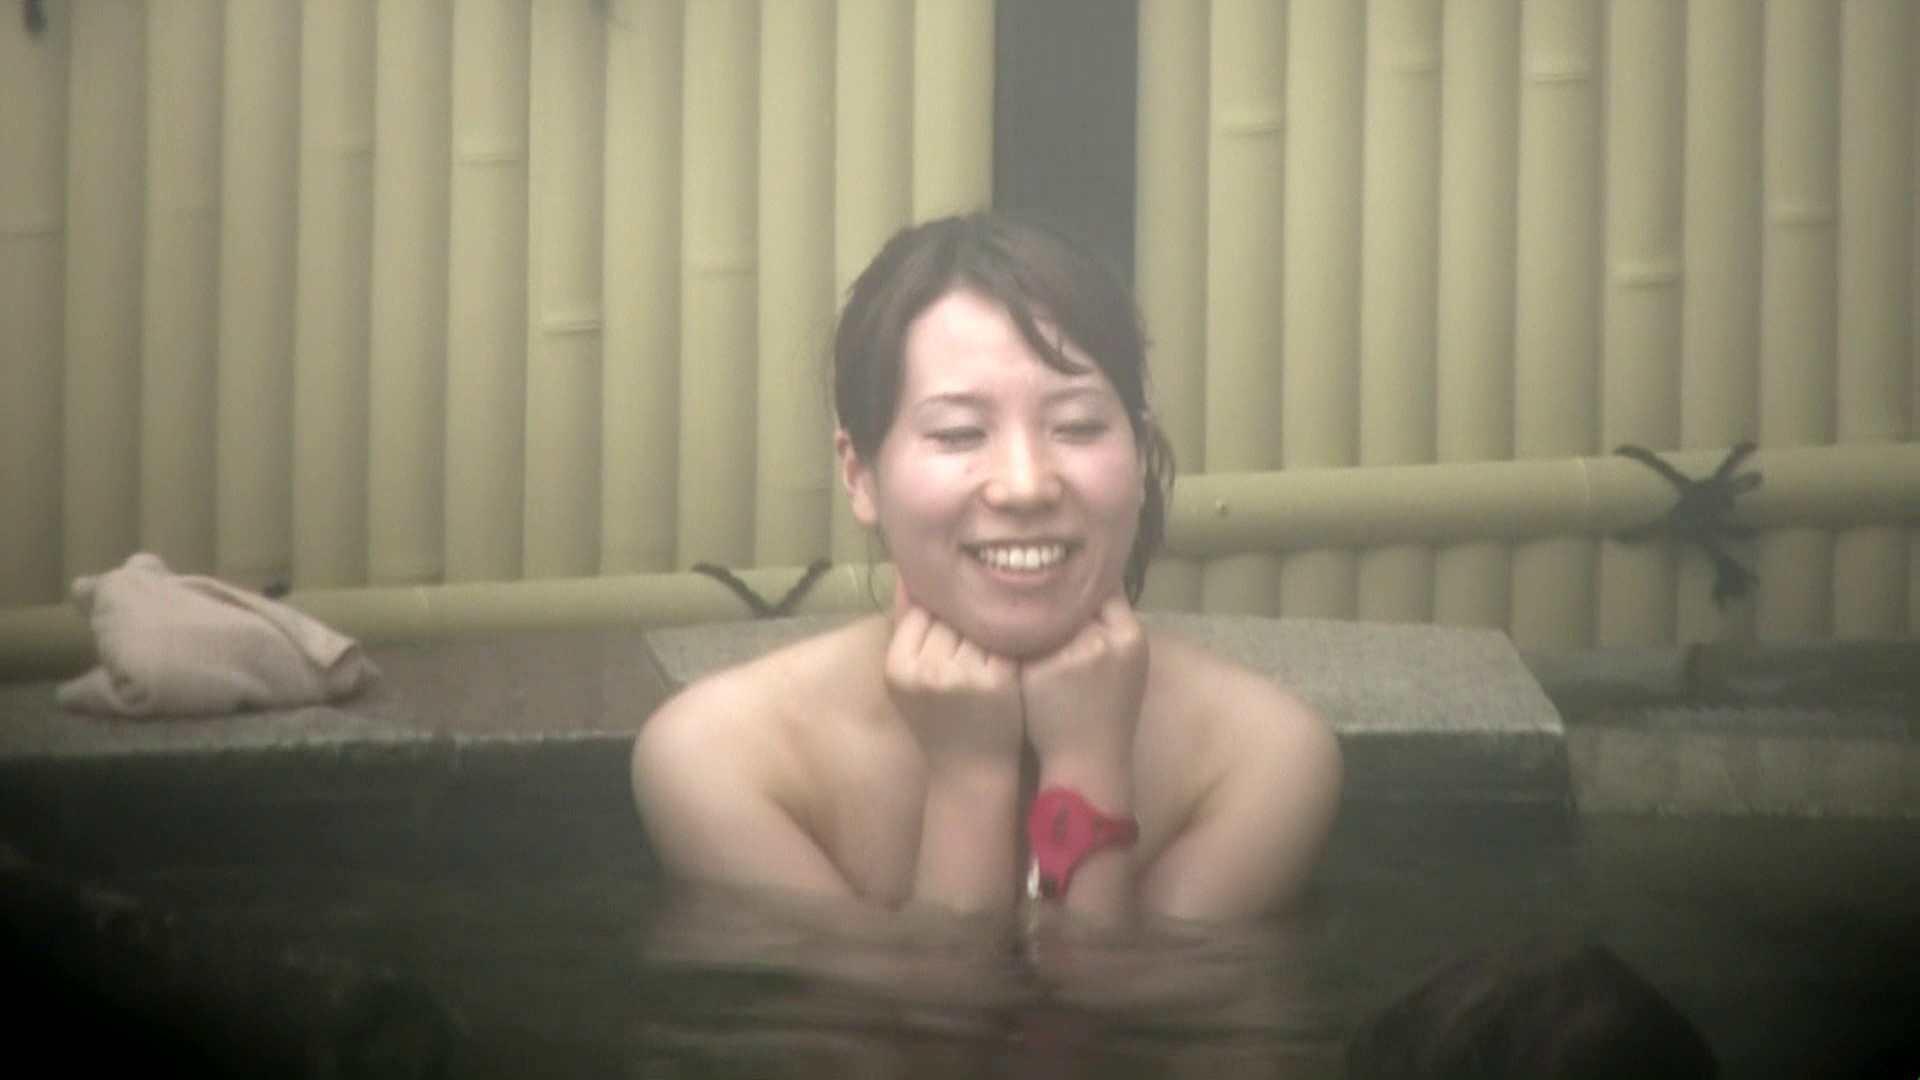 Aquaな露天風呂Vol.35【VIP】 0 | 0  105連発 81